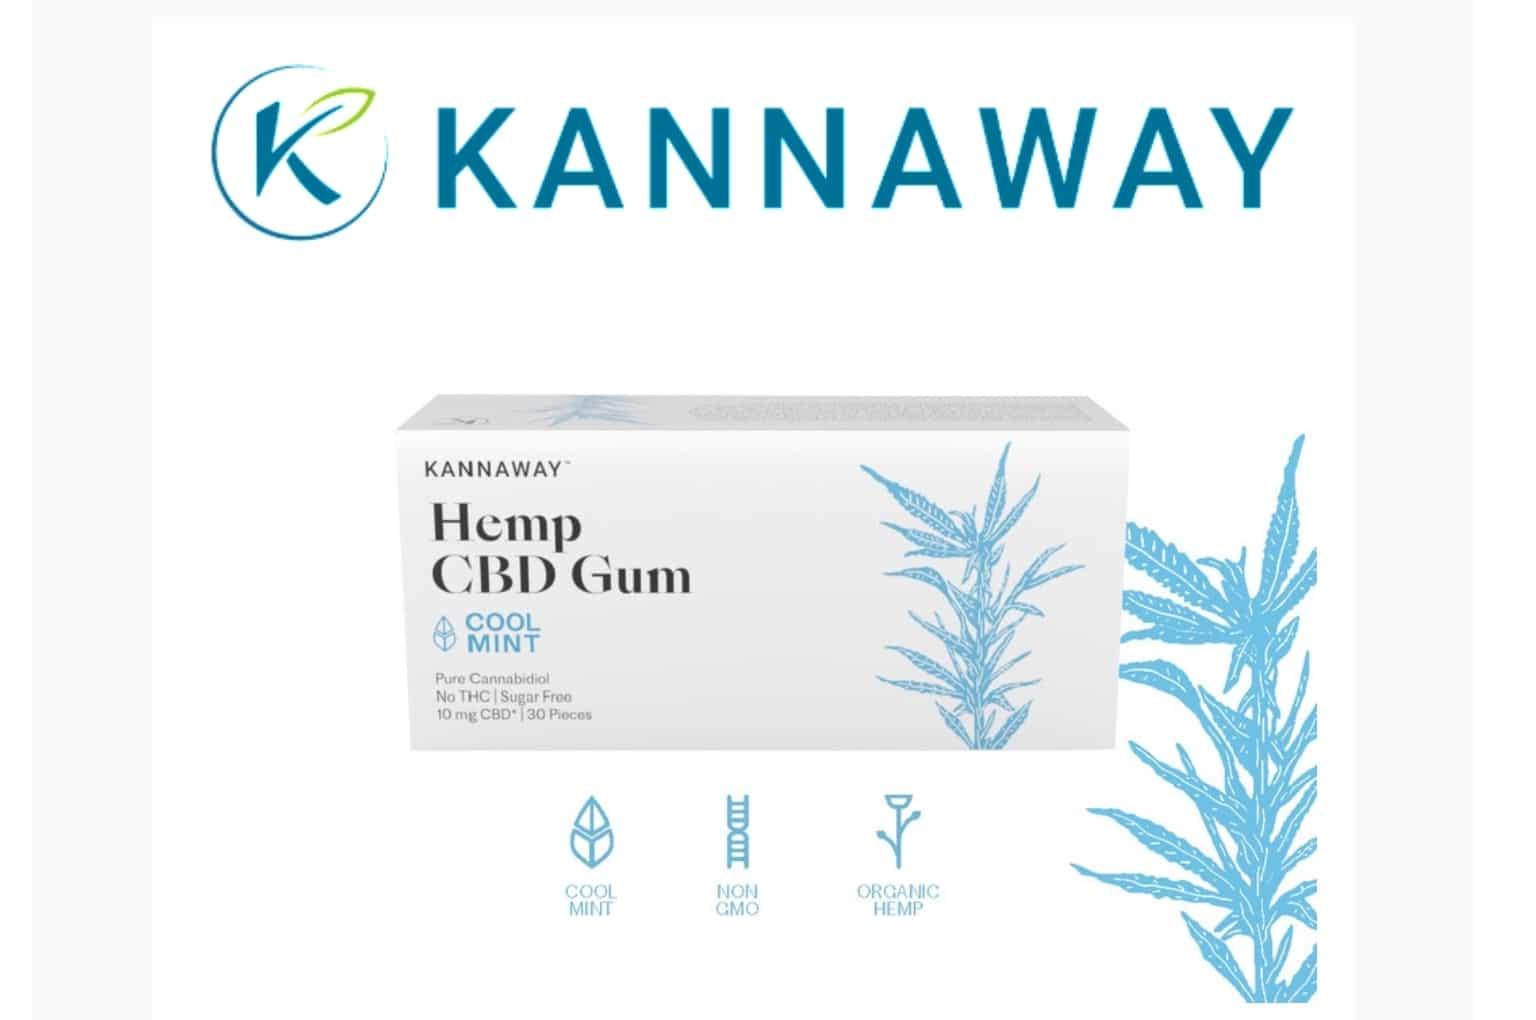 Kannaway Launches New Hemp CBD Gum – Cosmique UK